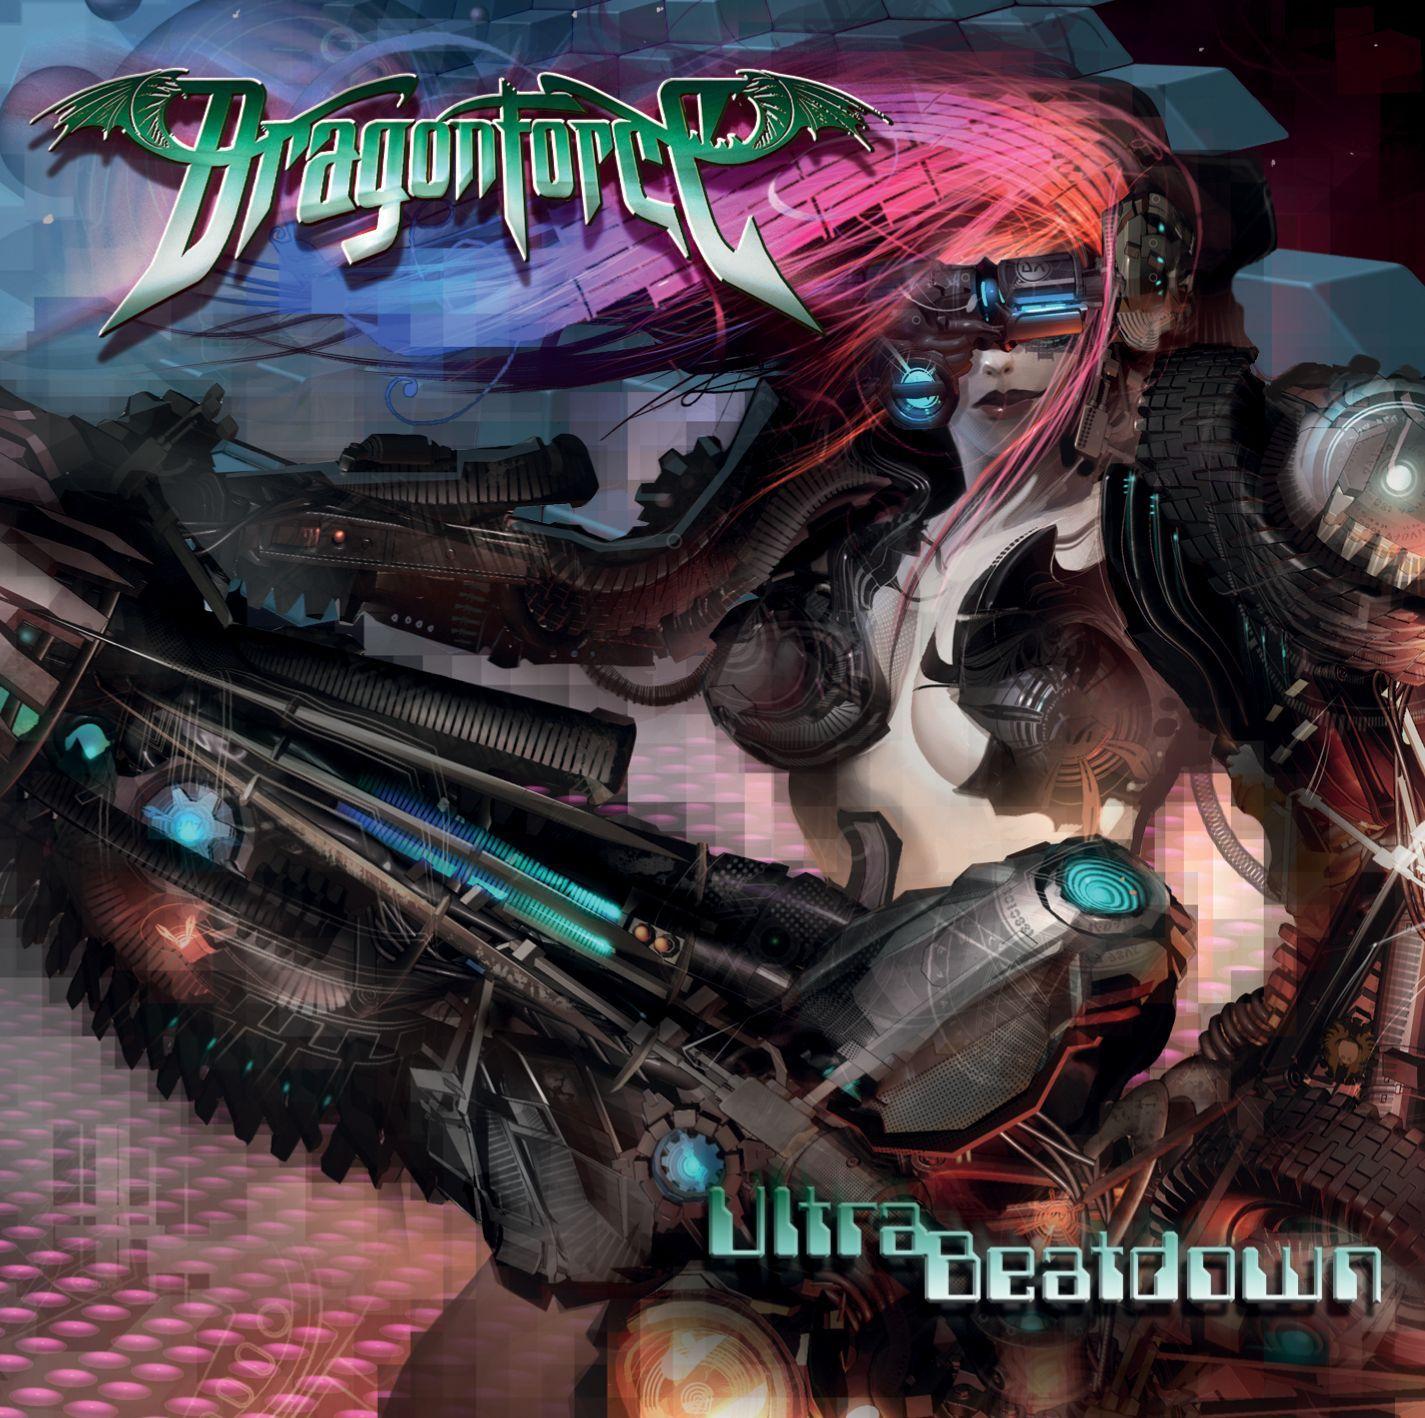 Dragonforce - Ultra Beatdown album cover